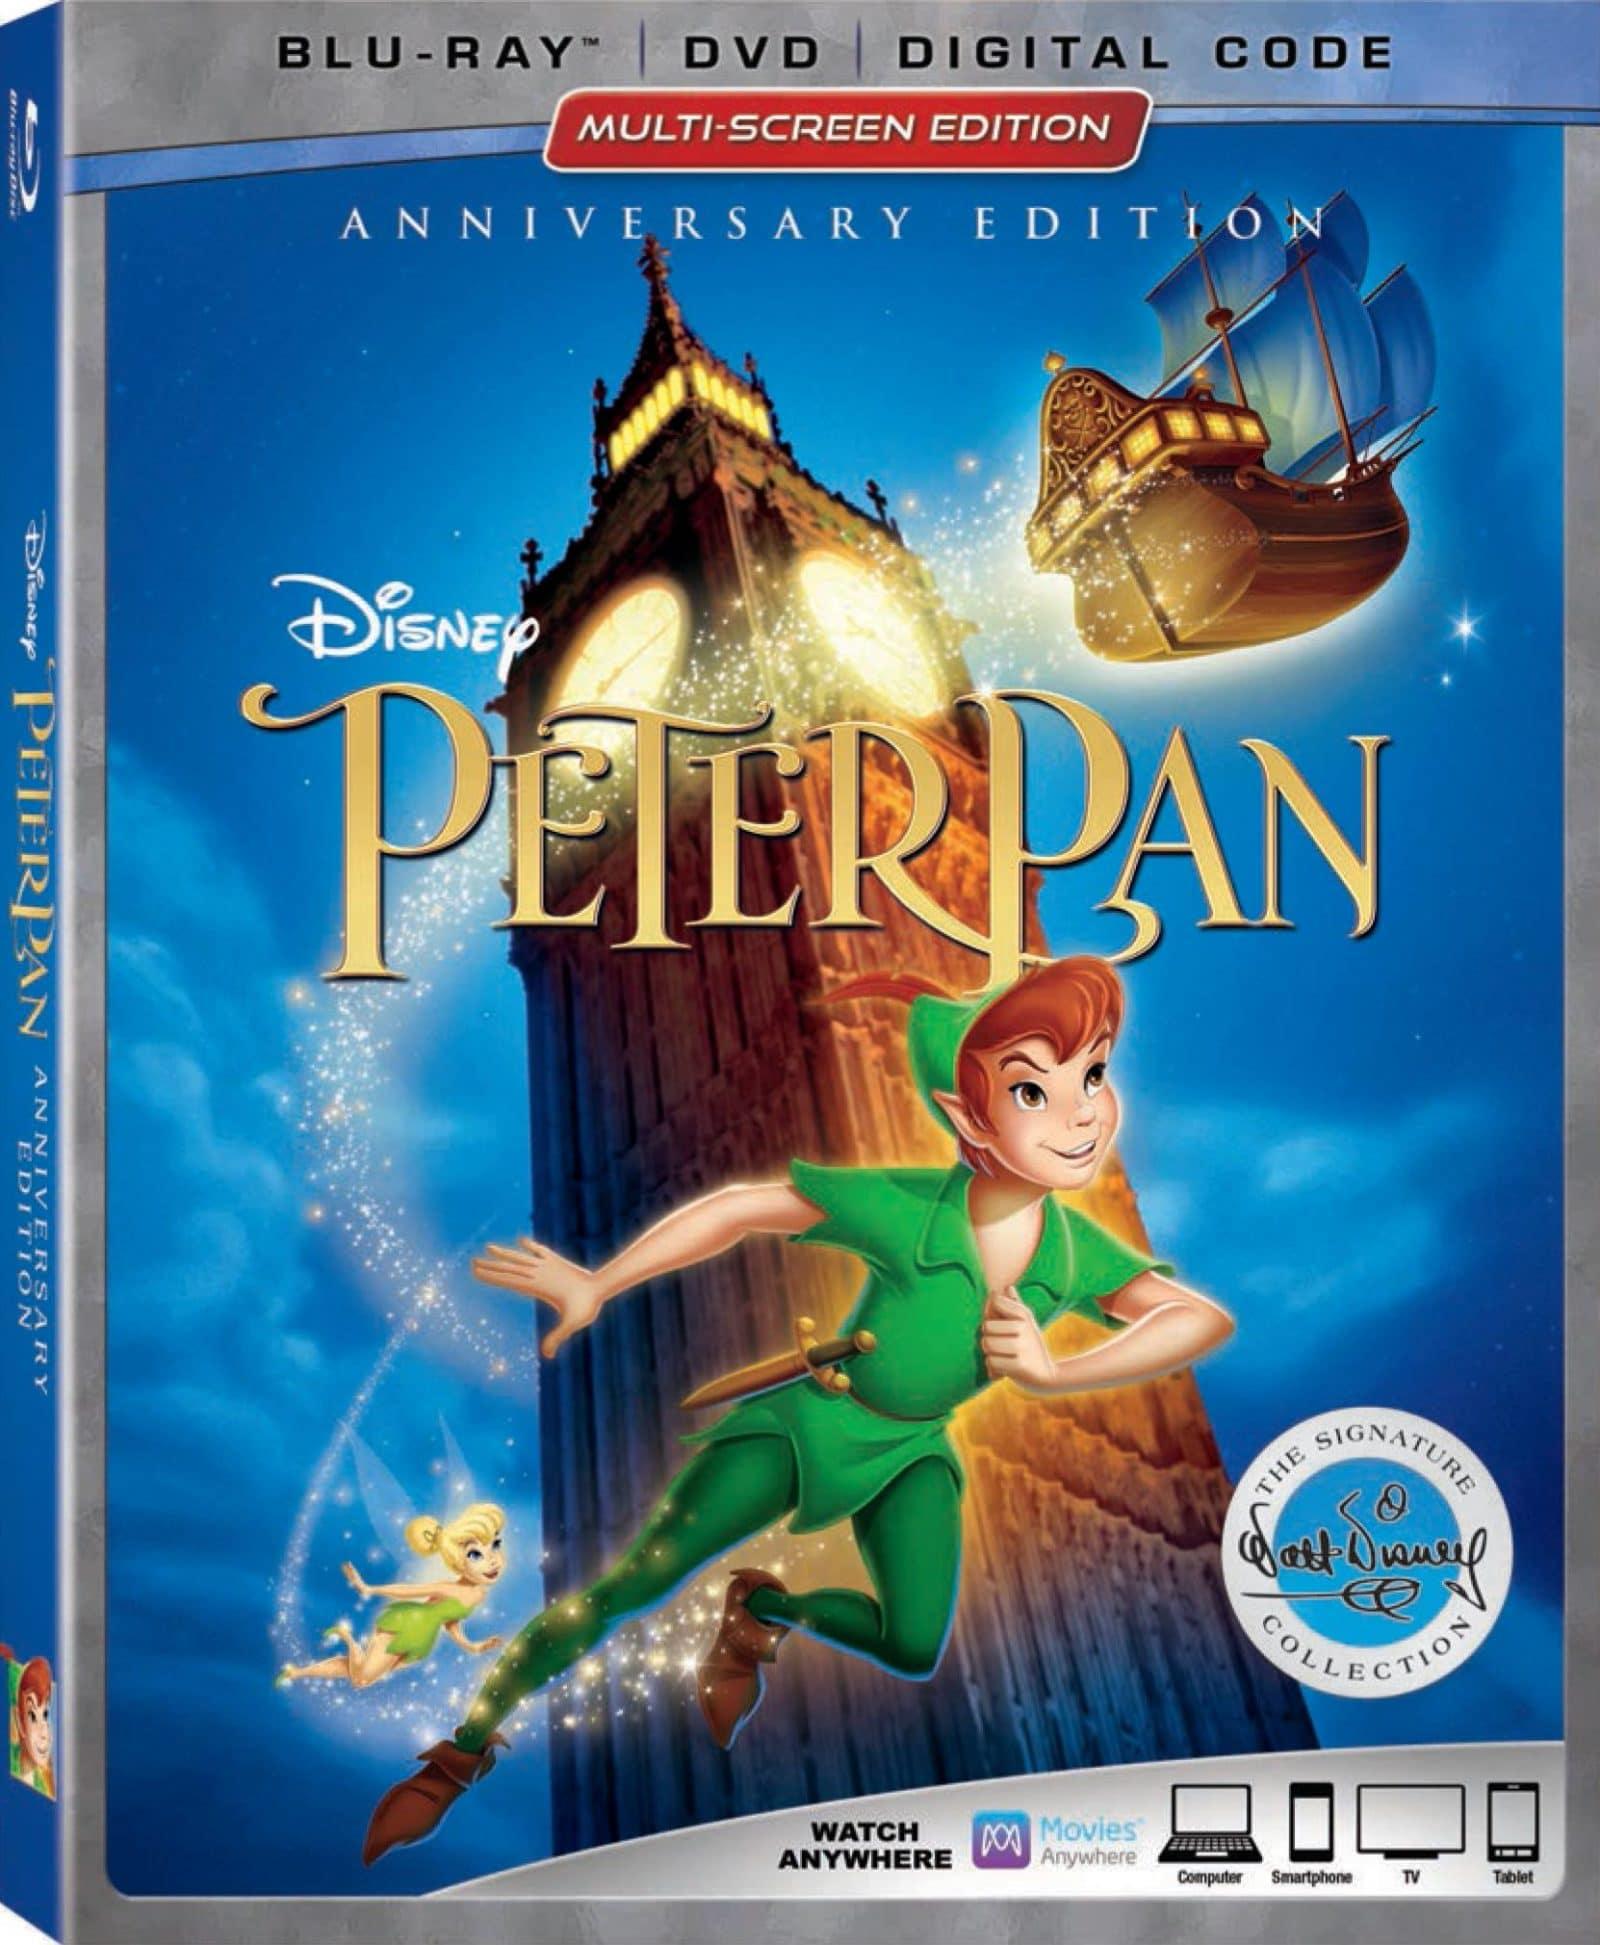 Peter Pan on Blu-ray